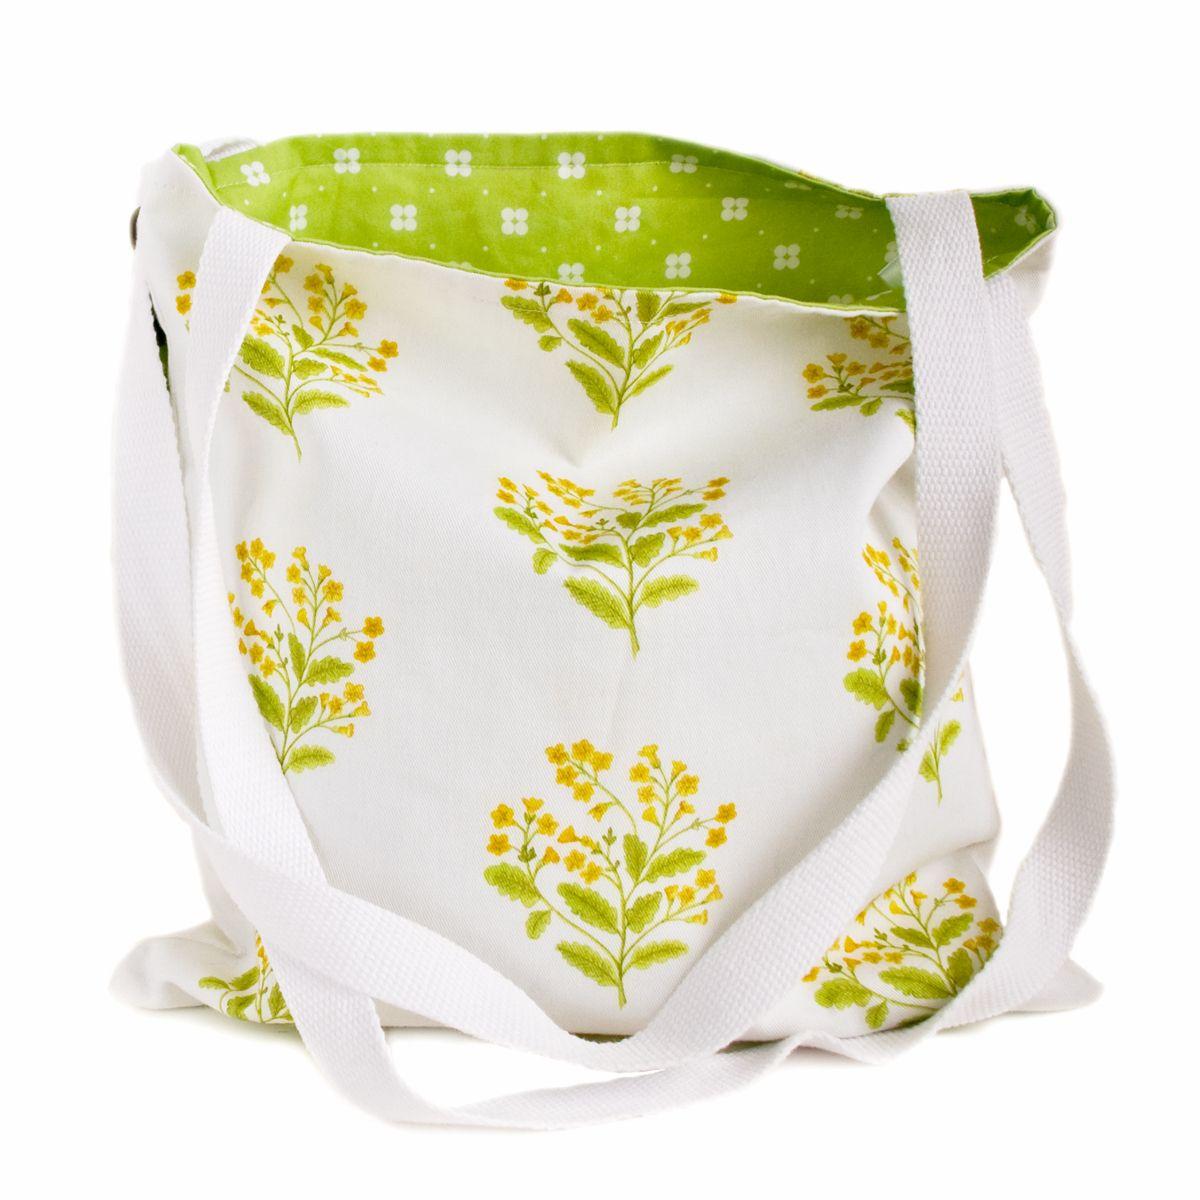 Summer tote bag in Cowslip design